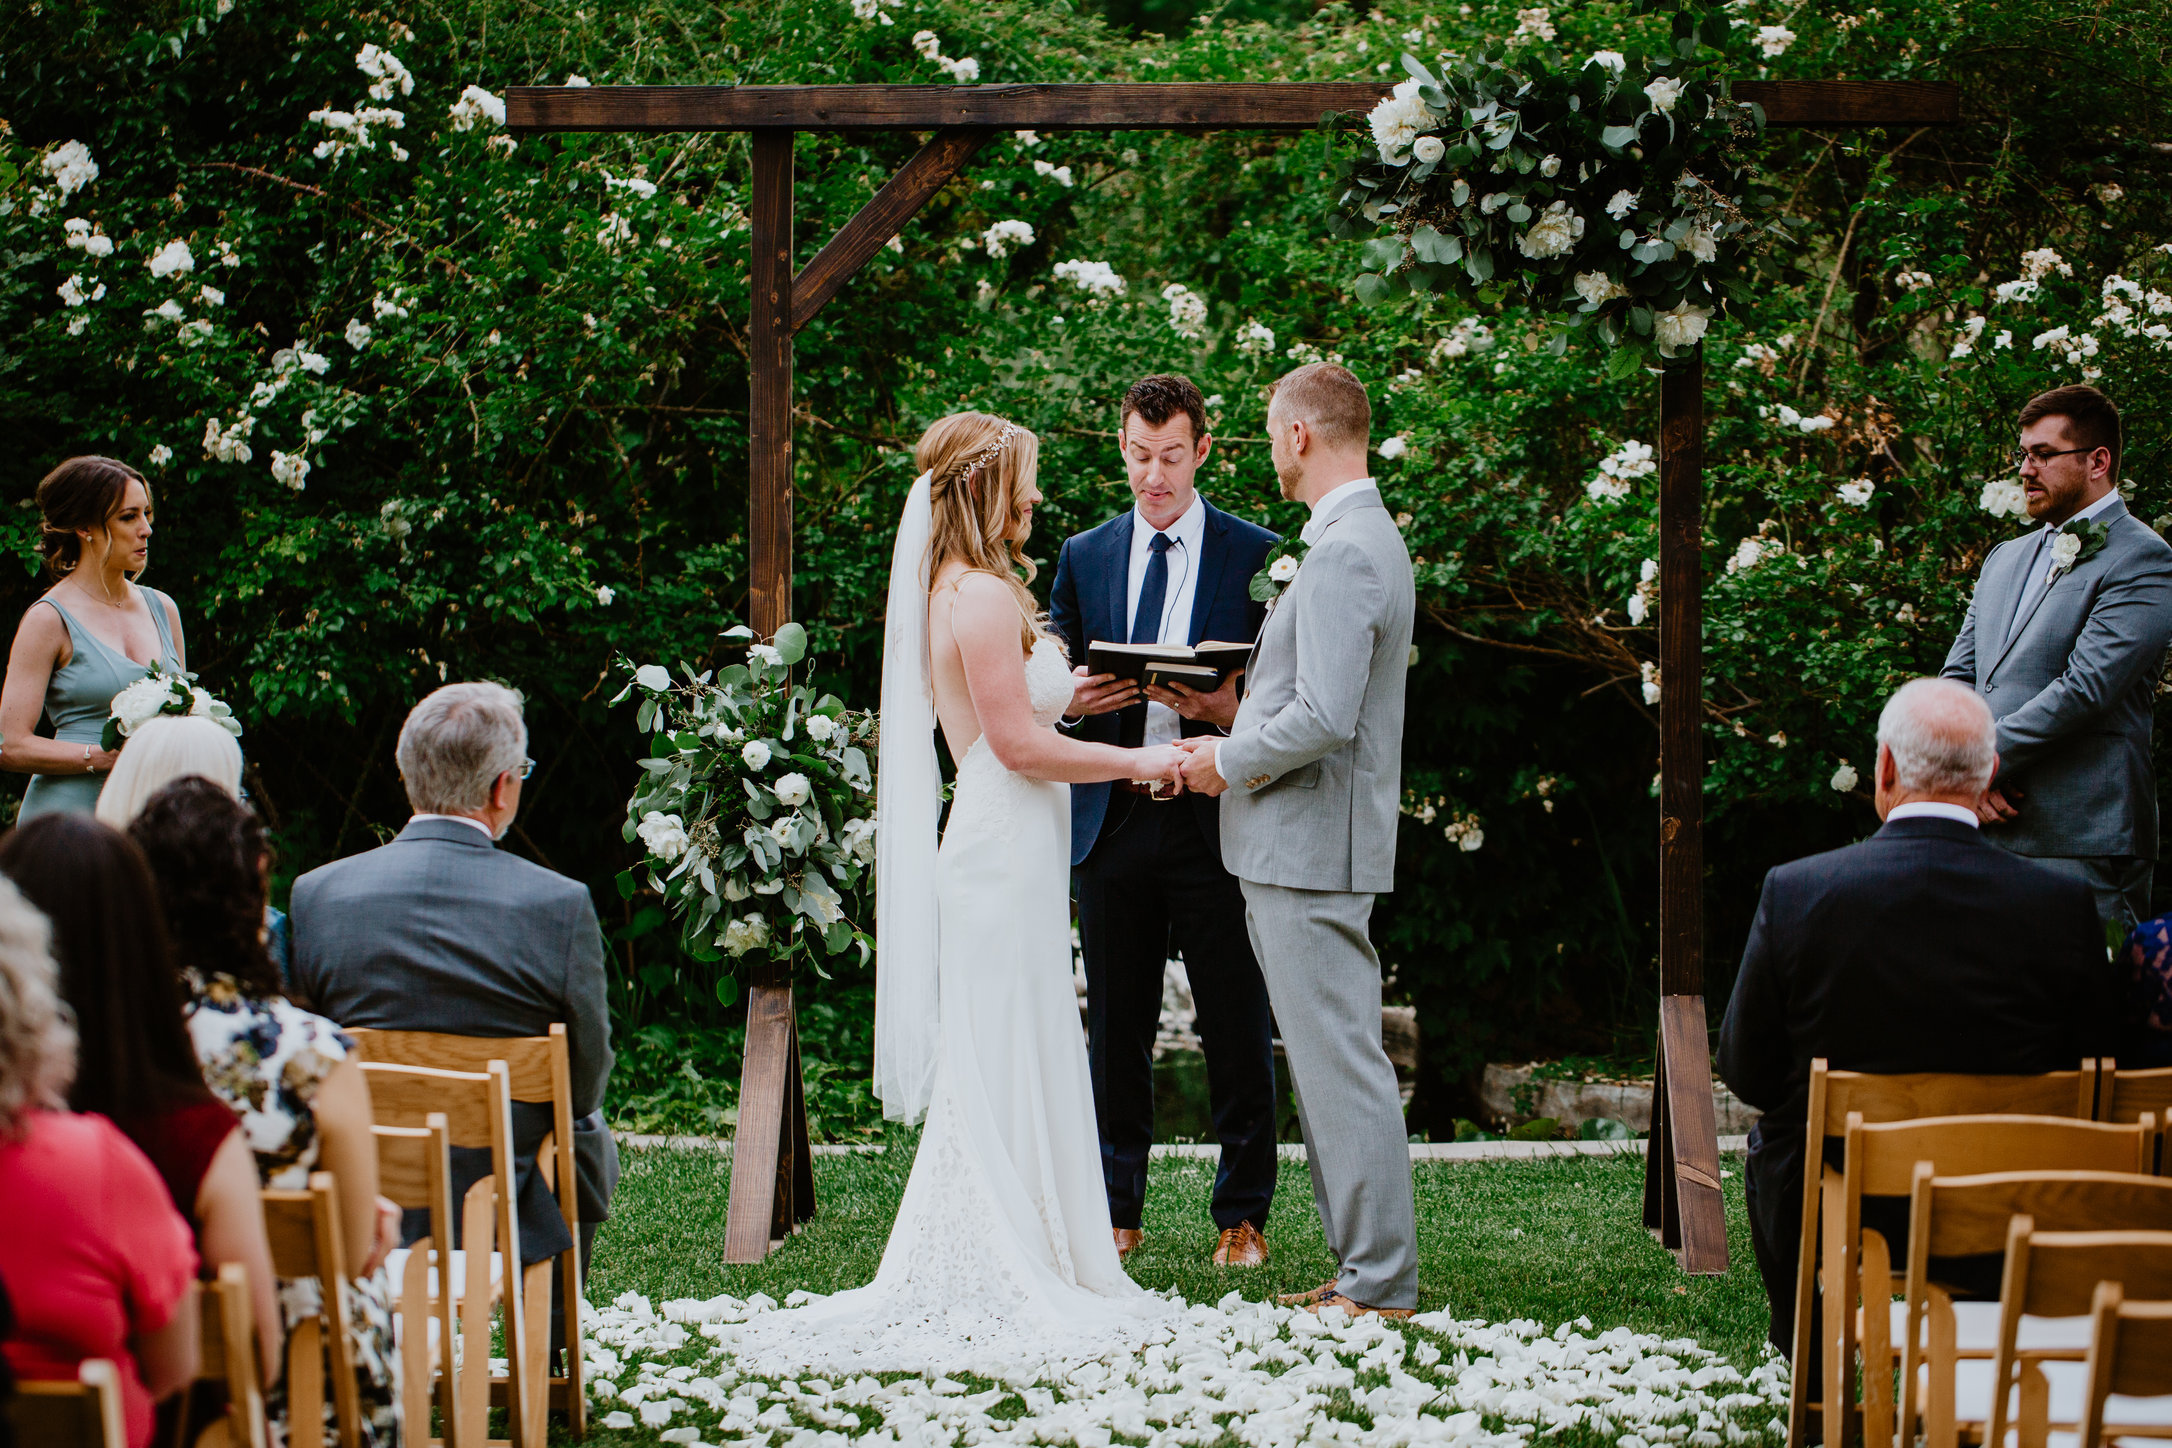 DandA-wedding-274.jpg